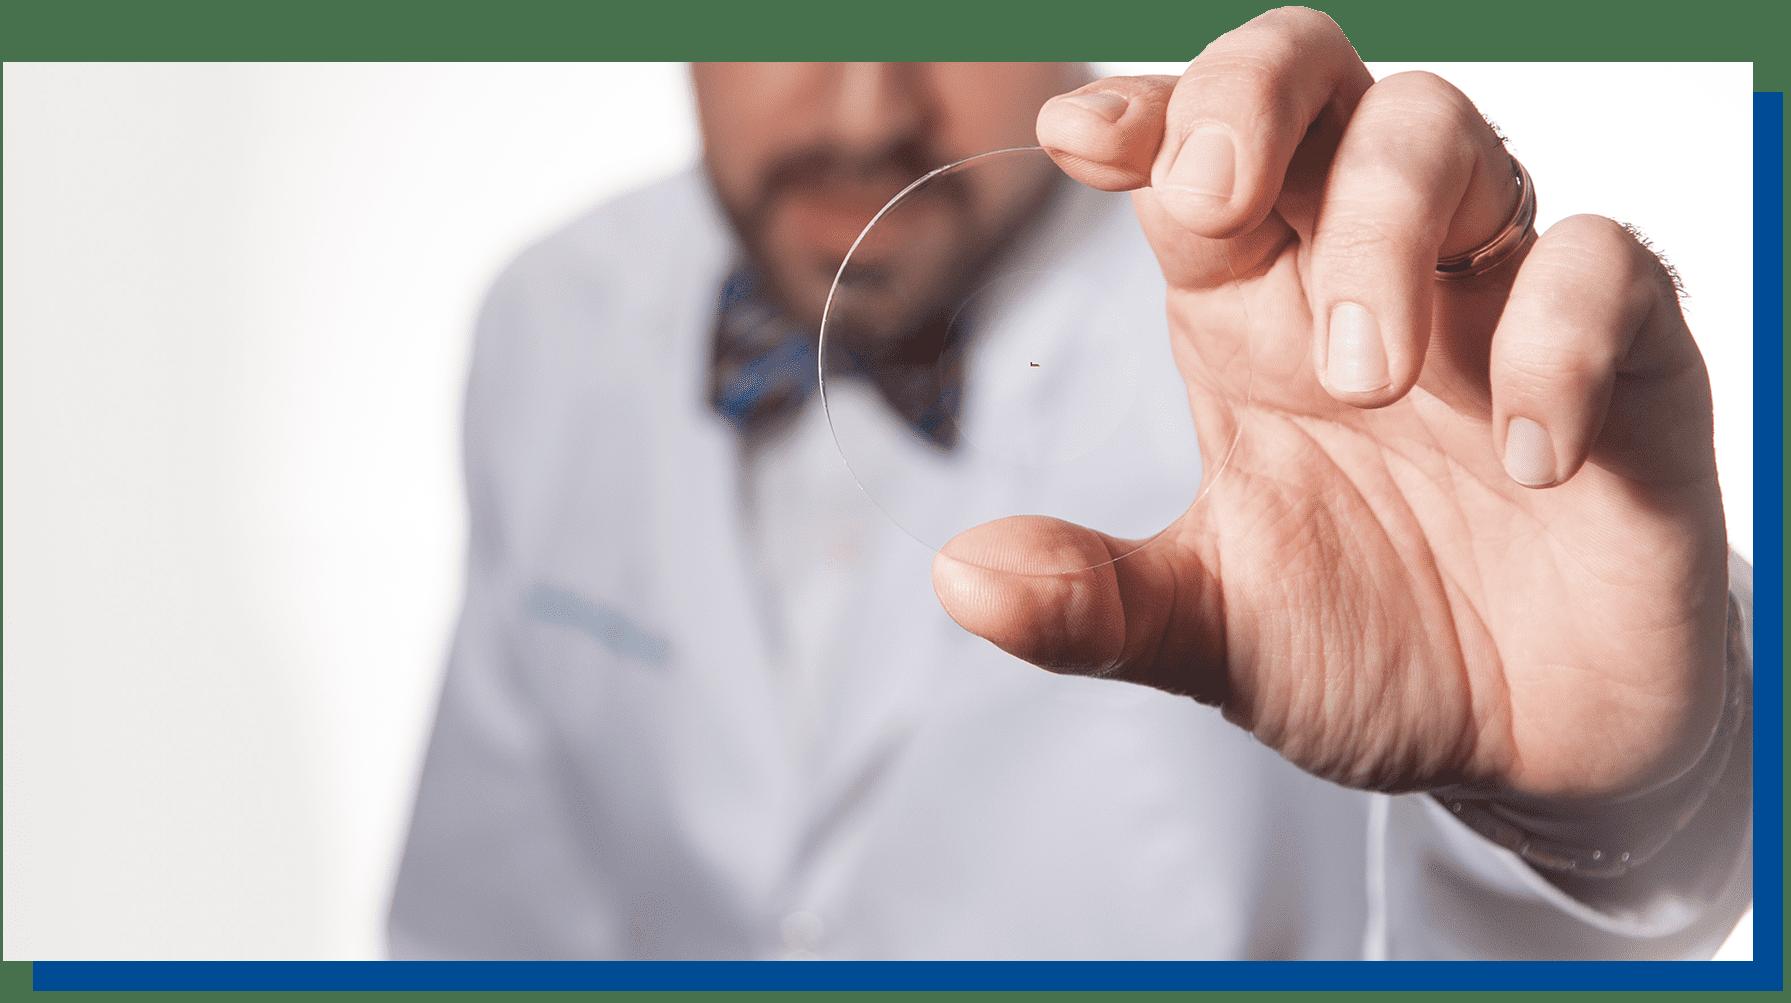 Visian® Implantable Contact Lenses